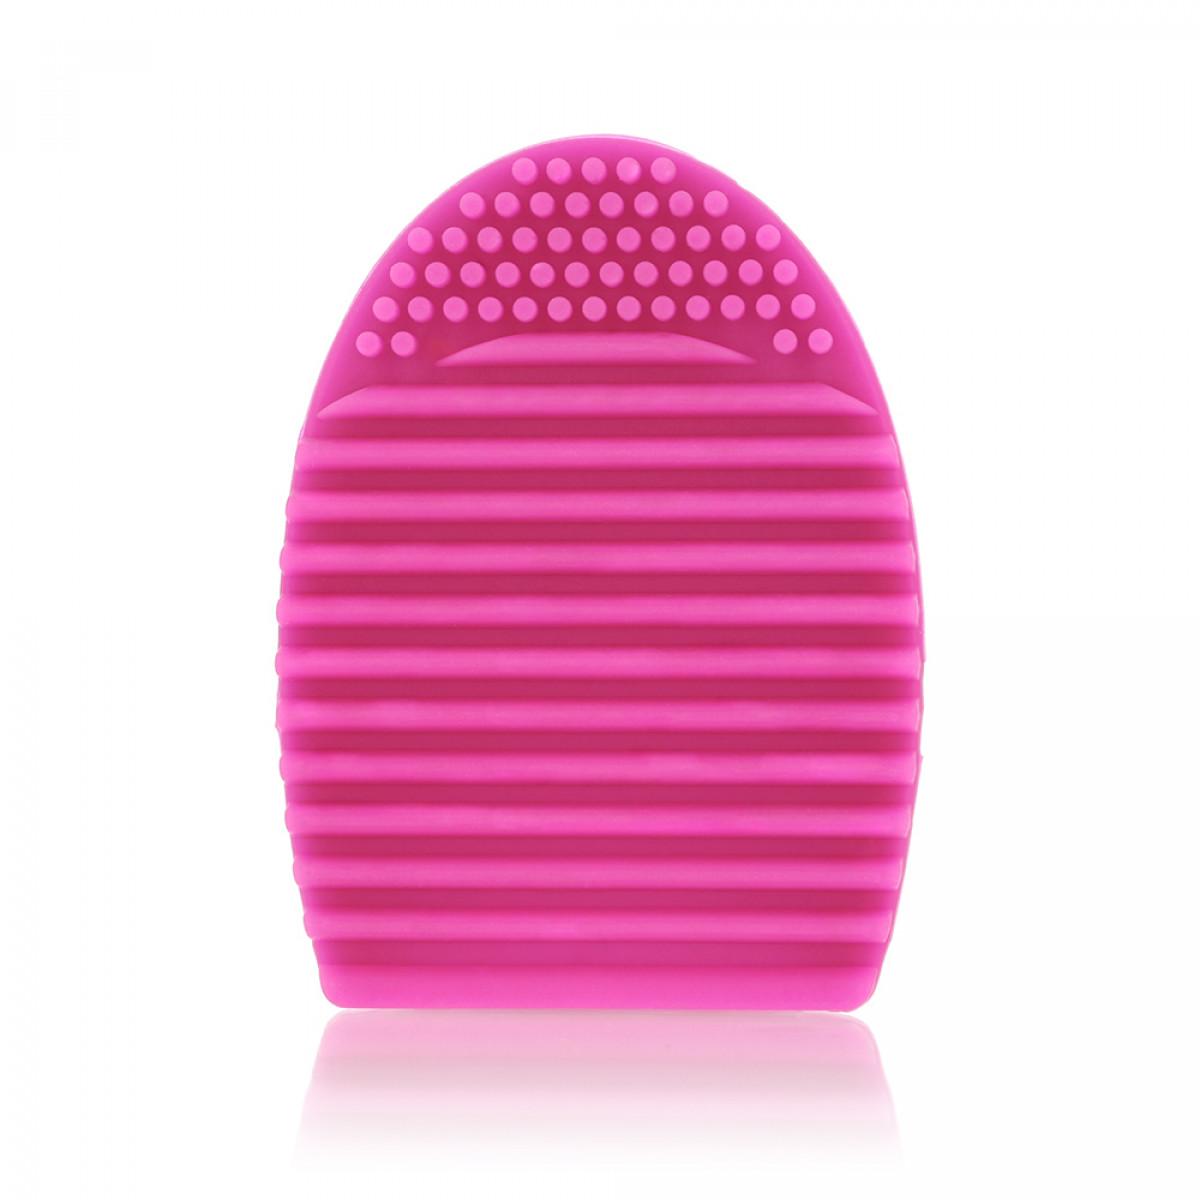 Nettoyer silicone image intitule remove silicone caulk from hands step gant de nettoyage - Produit pour enlever le silicone sec ...